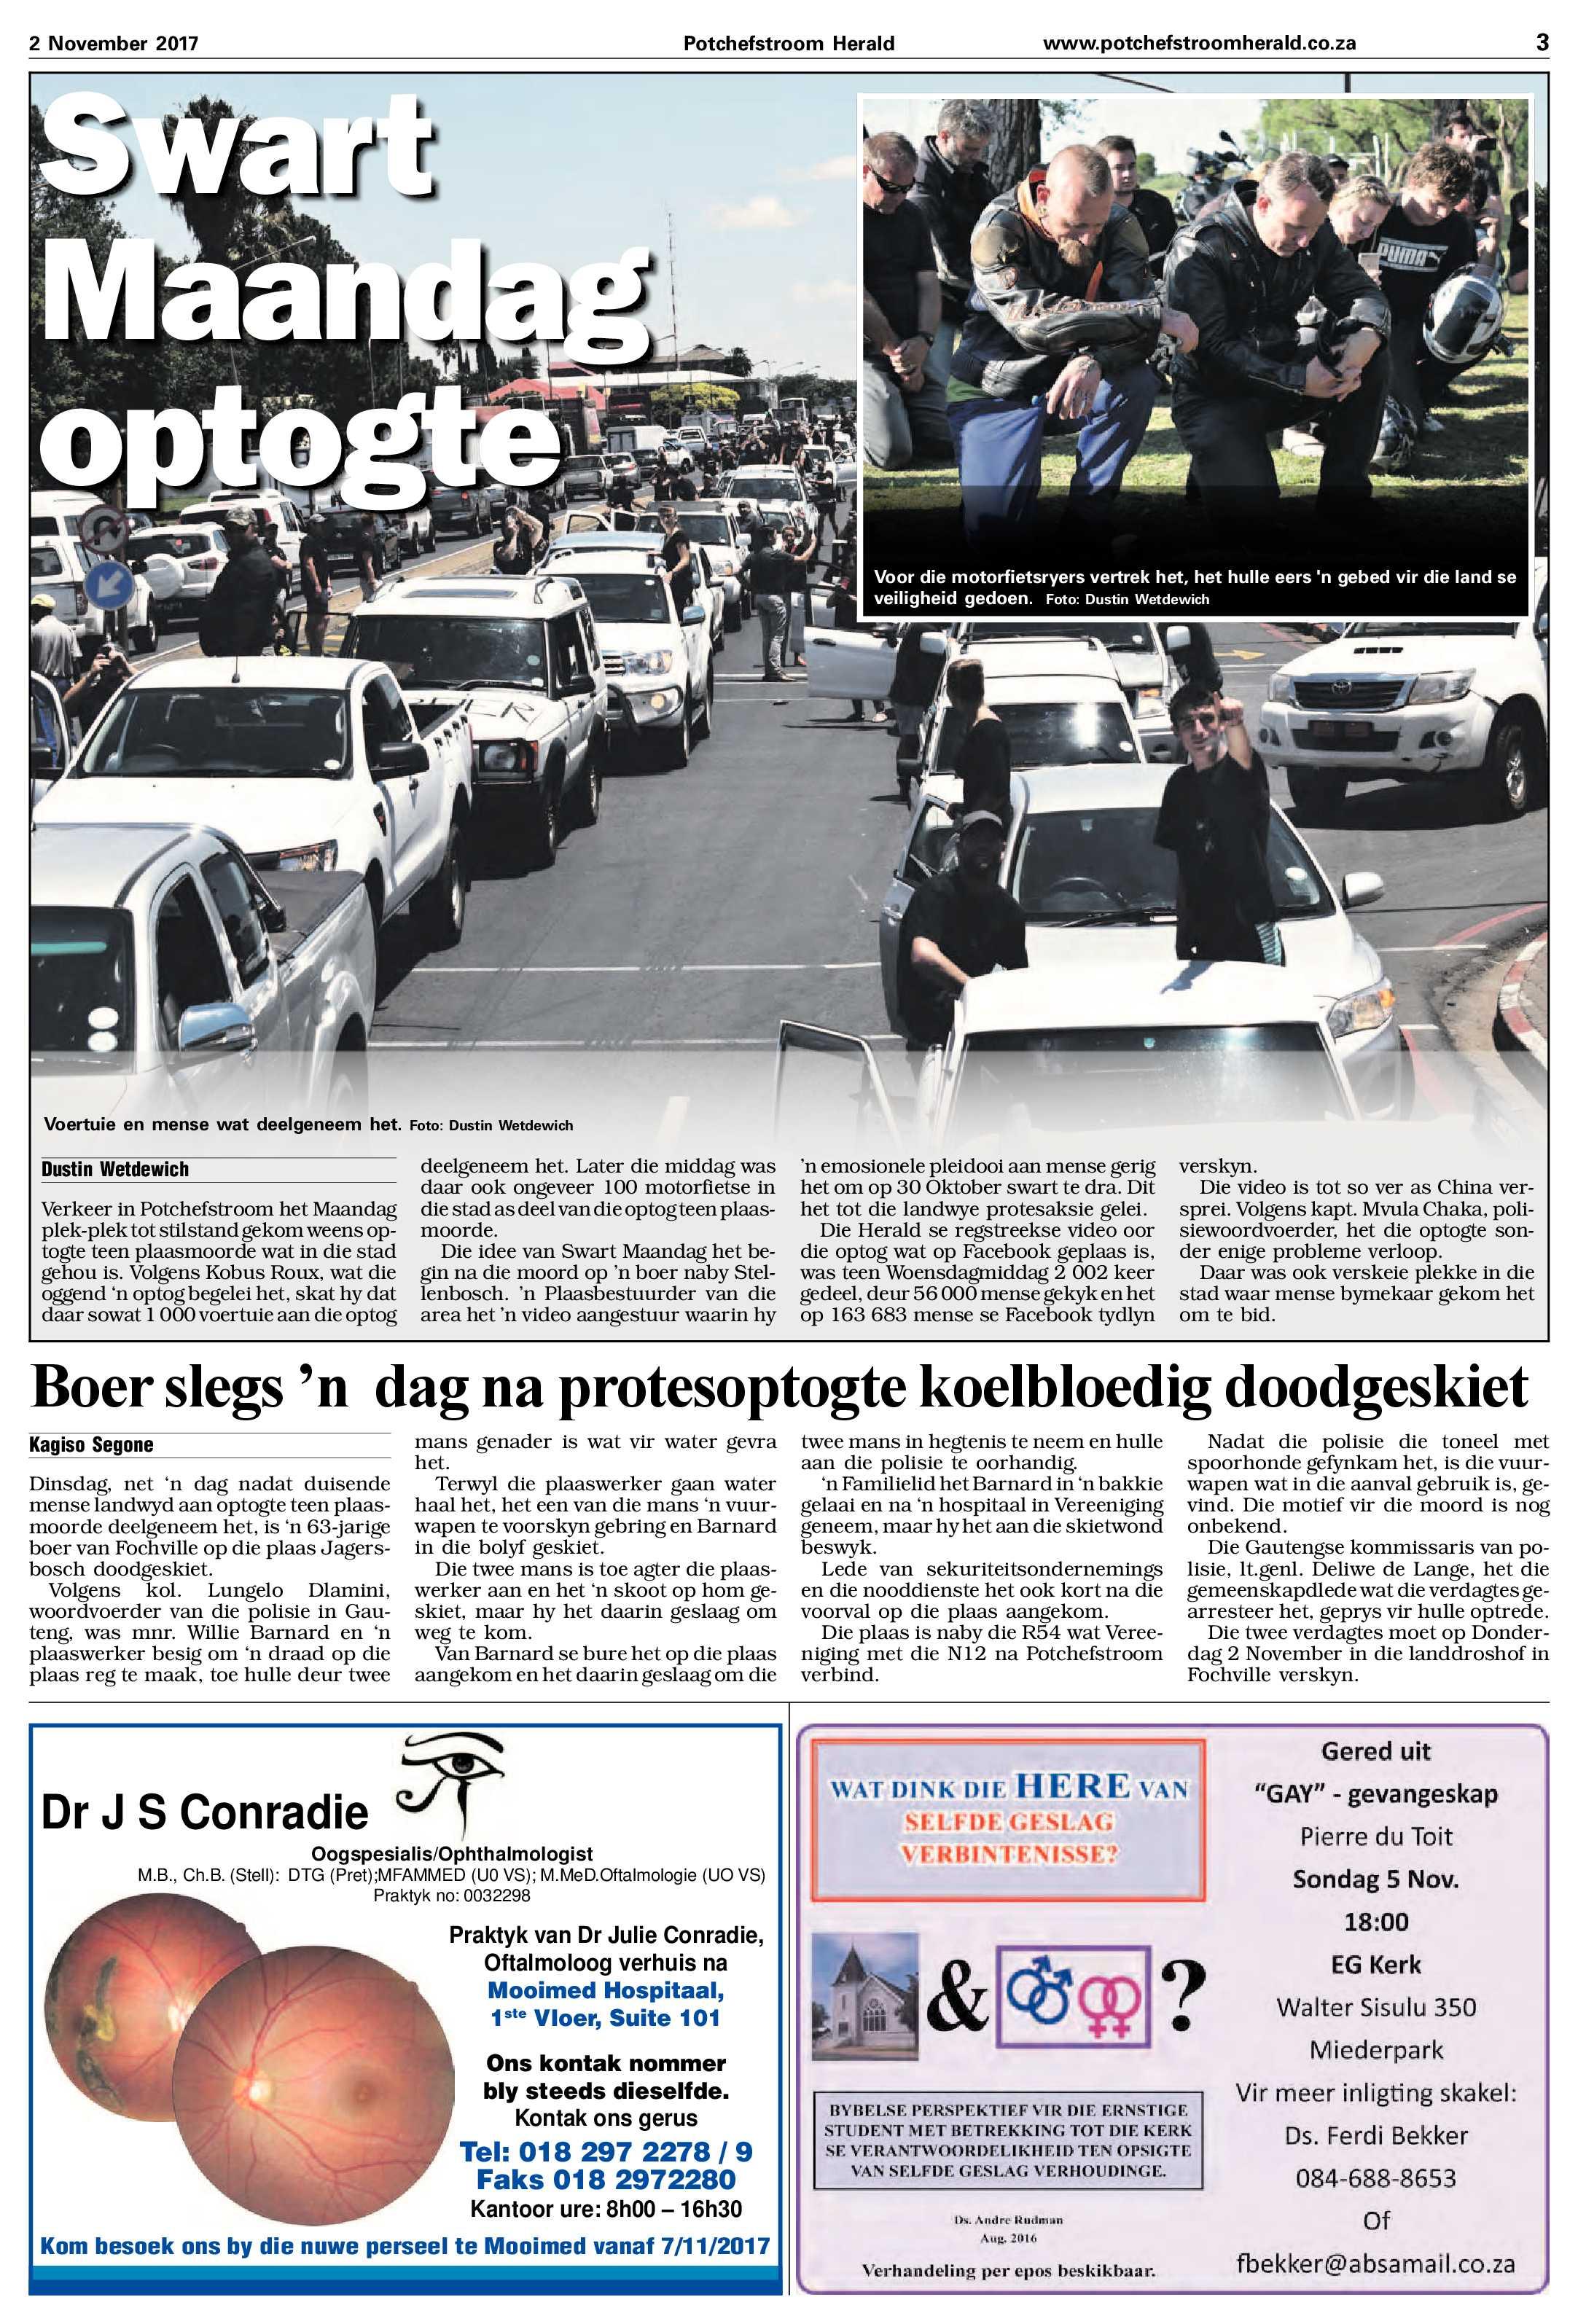 2-november-2017-epapers-page-3